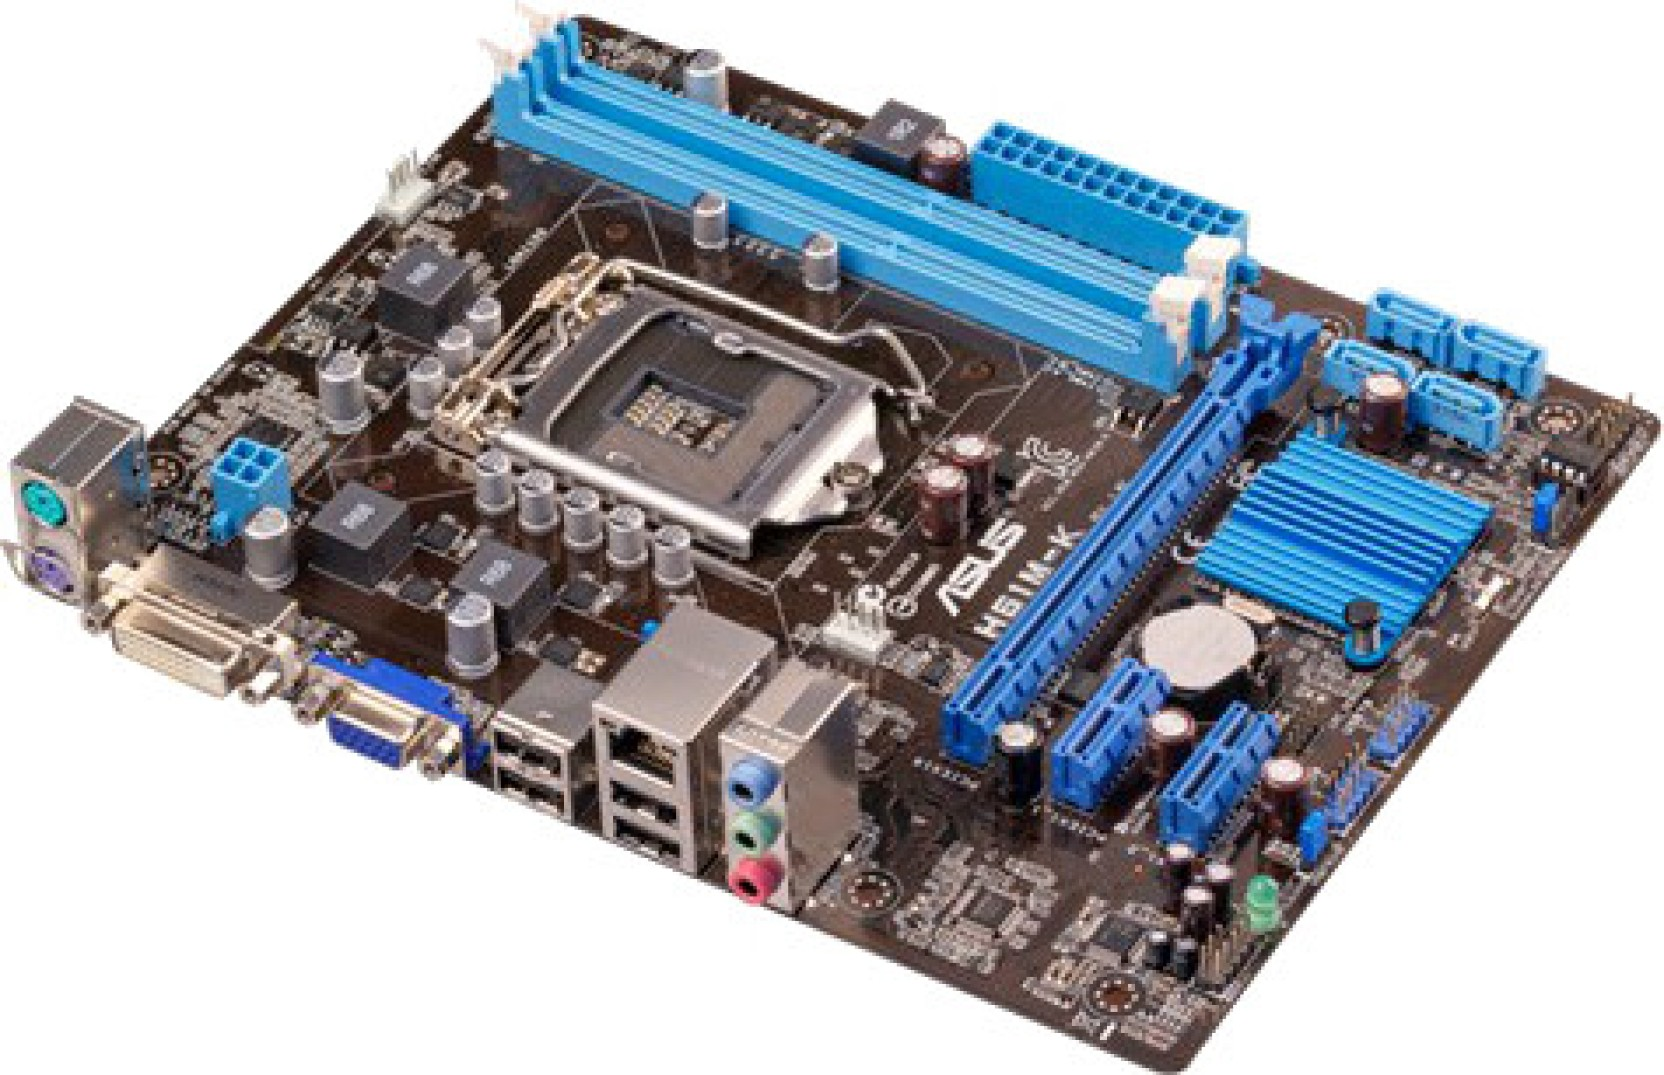 Asus H61M-K Motherboard